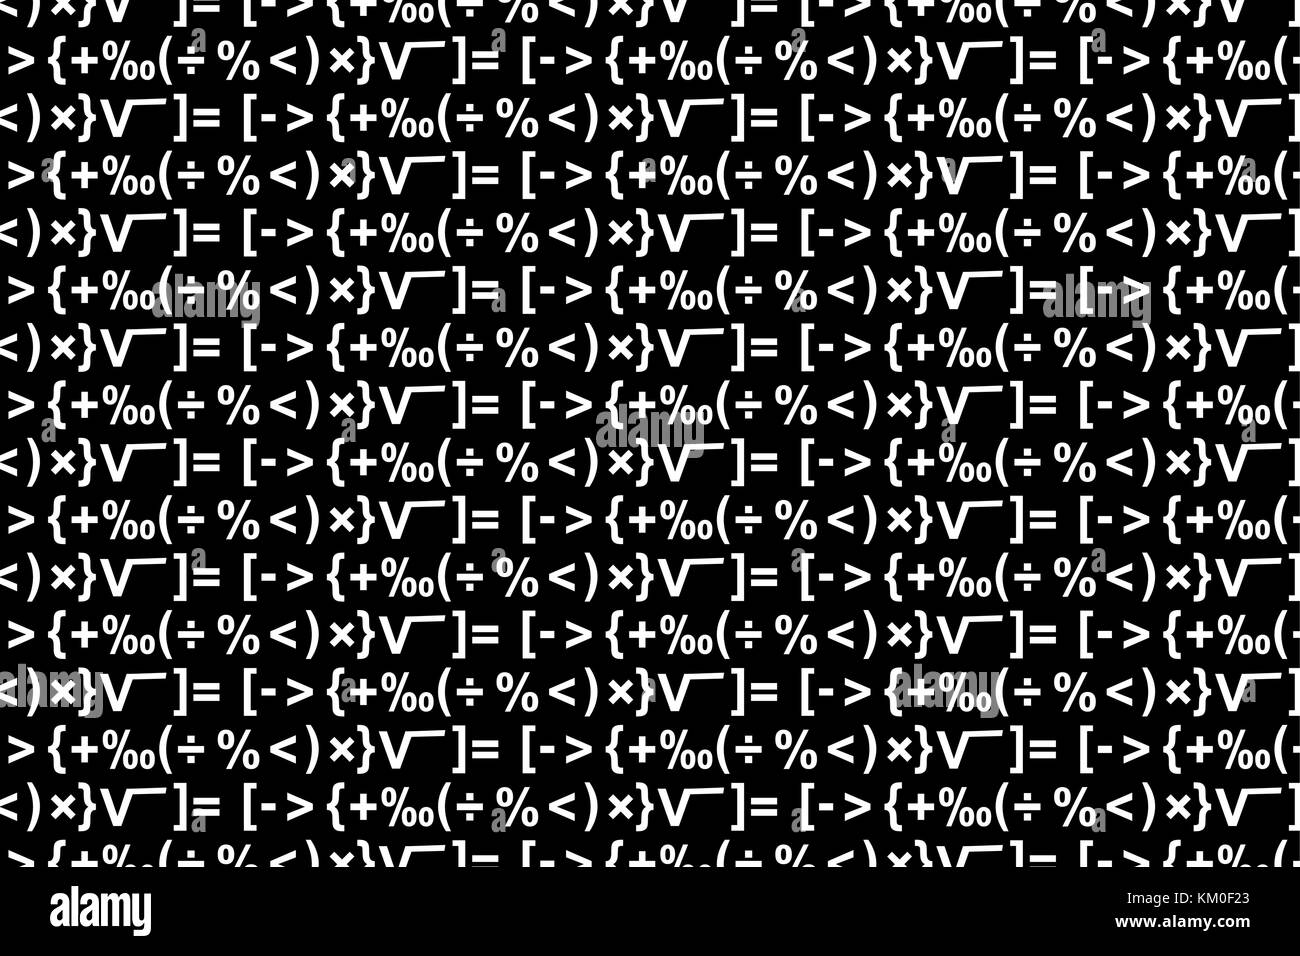 Mathematical symbols stock photos mathematical symbols stock mathematical symbols black and white vector pattern stock image buycottarizona Images